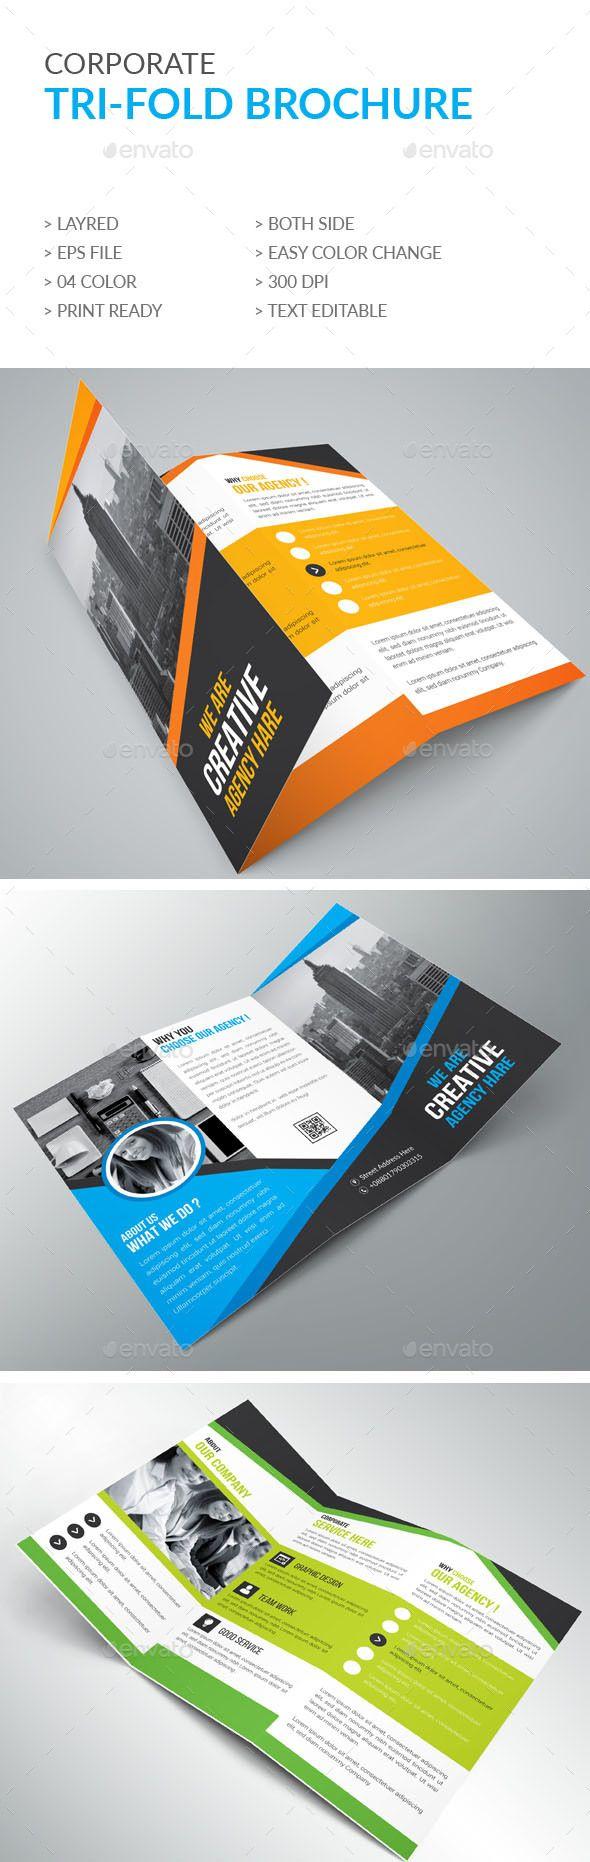 Trifold Brochure - Brochures Print Templates Download here : https://graphicriver.net/item/trifold-brochure/18914085?s_rank=149&ref=Al-fatih